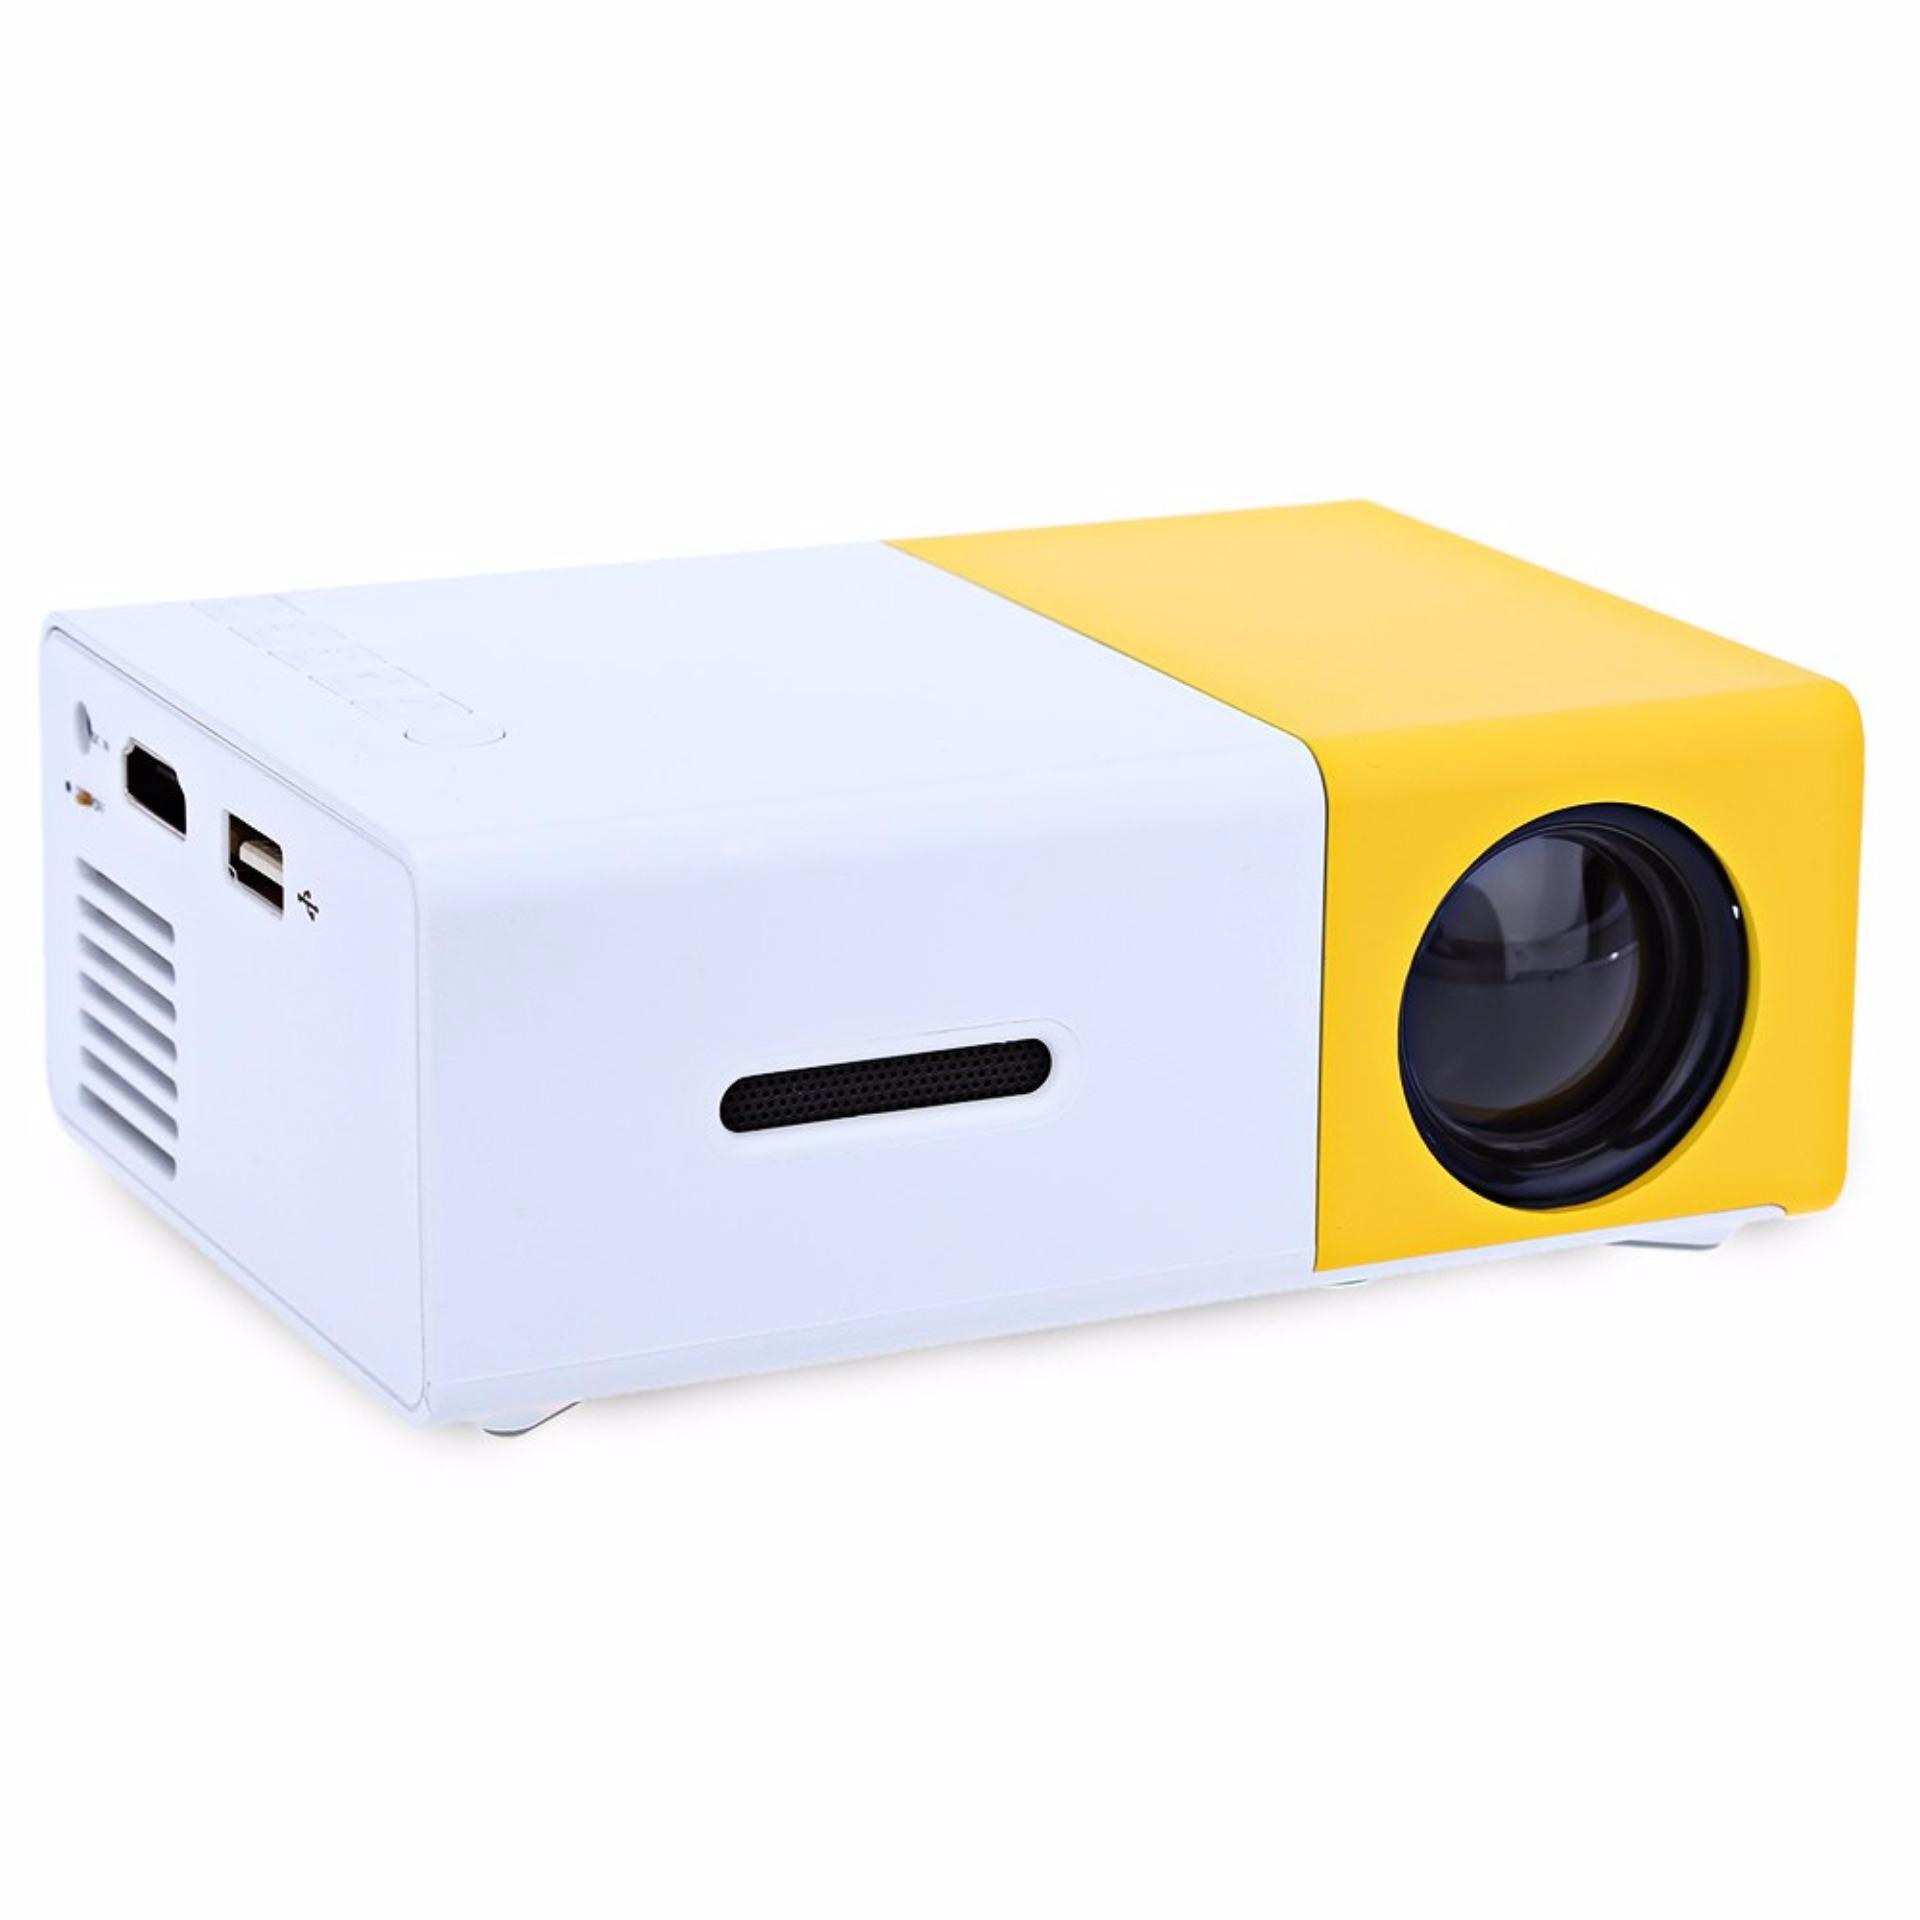 Tokuniku Super Mini Portable LED  Projector YG300 LCD Support 1080P 400 - 600 Lumens 320 x 240 Pixels Home Cinema - Putih/Kuning